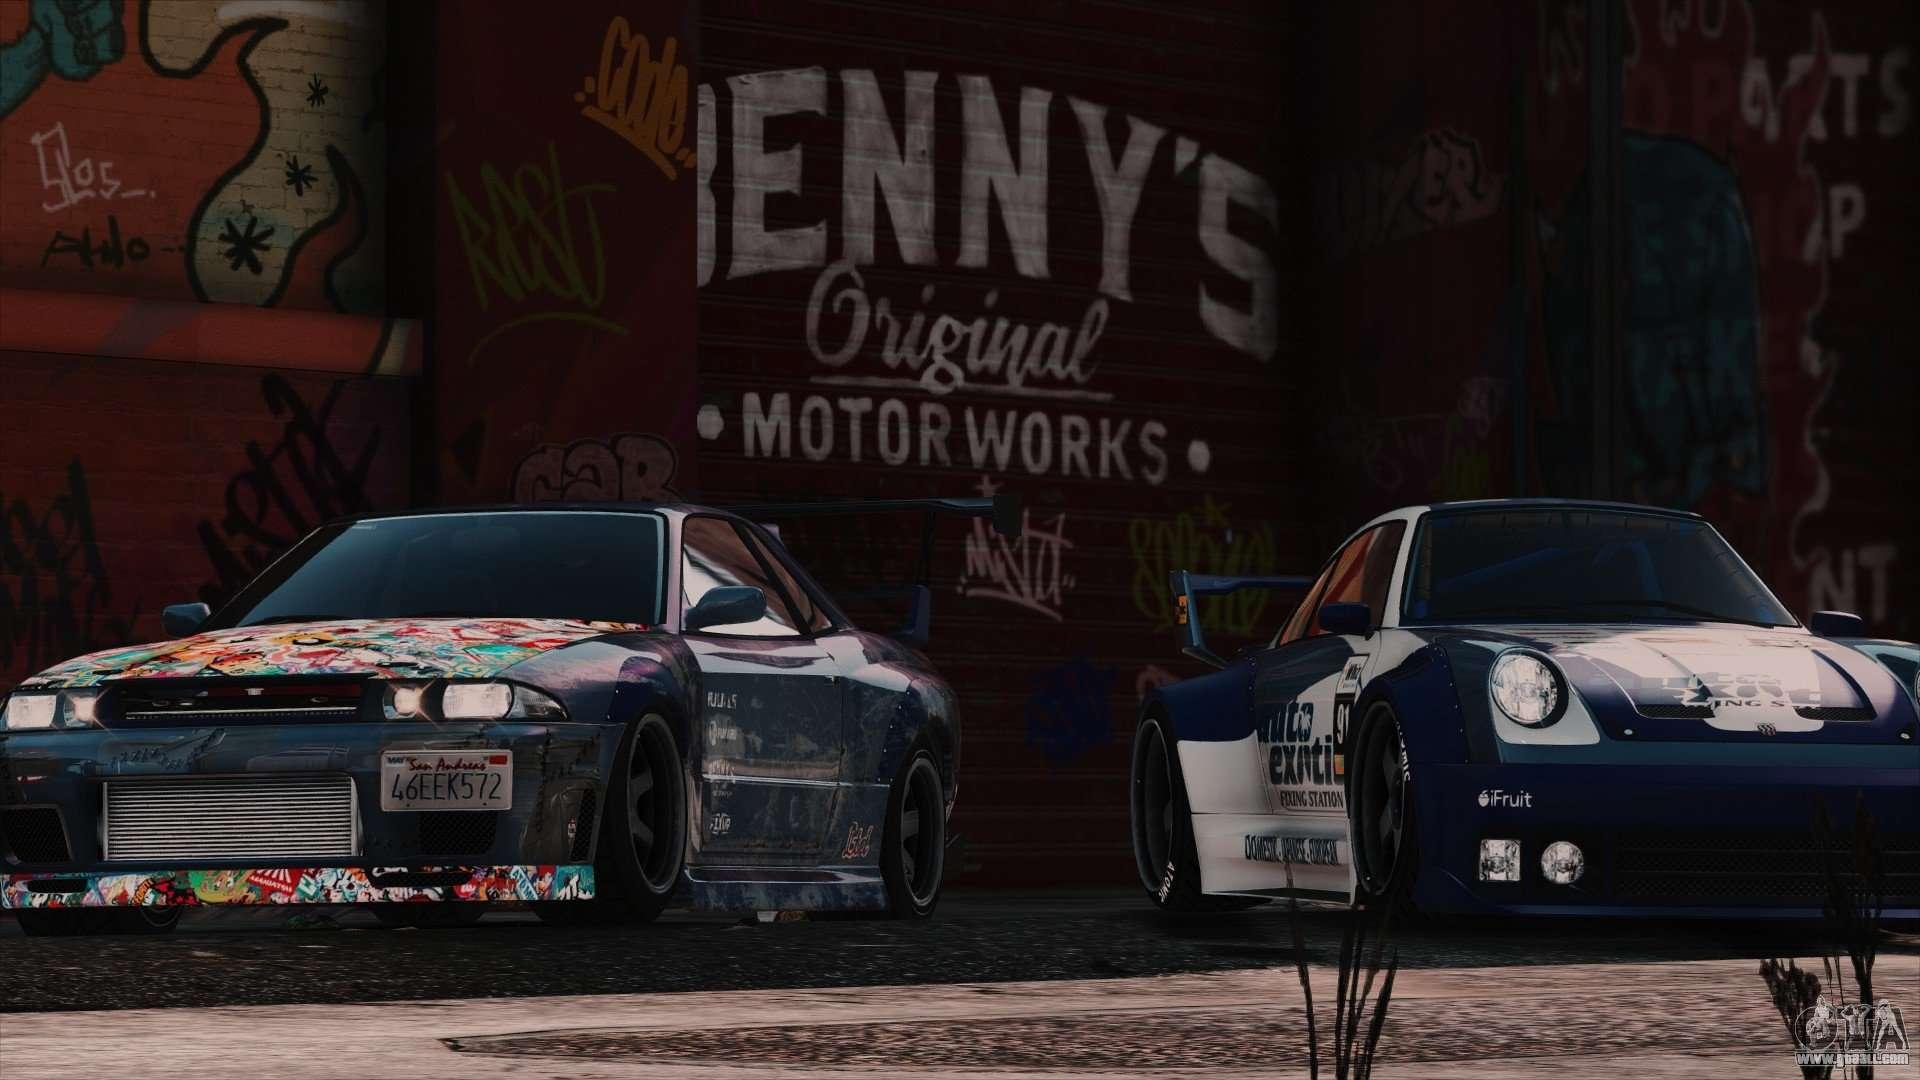 New Bennys Original Motor Works In Sp 1 5 4 For Gta 5